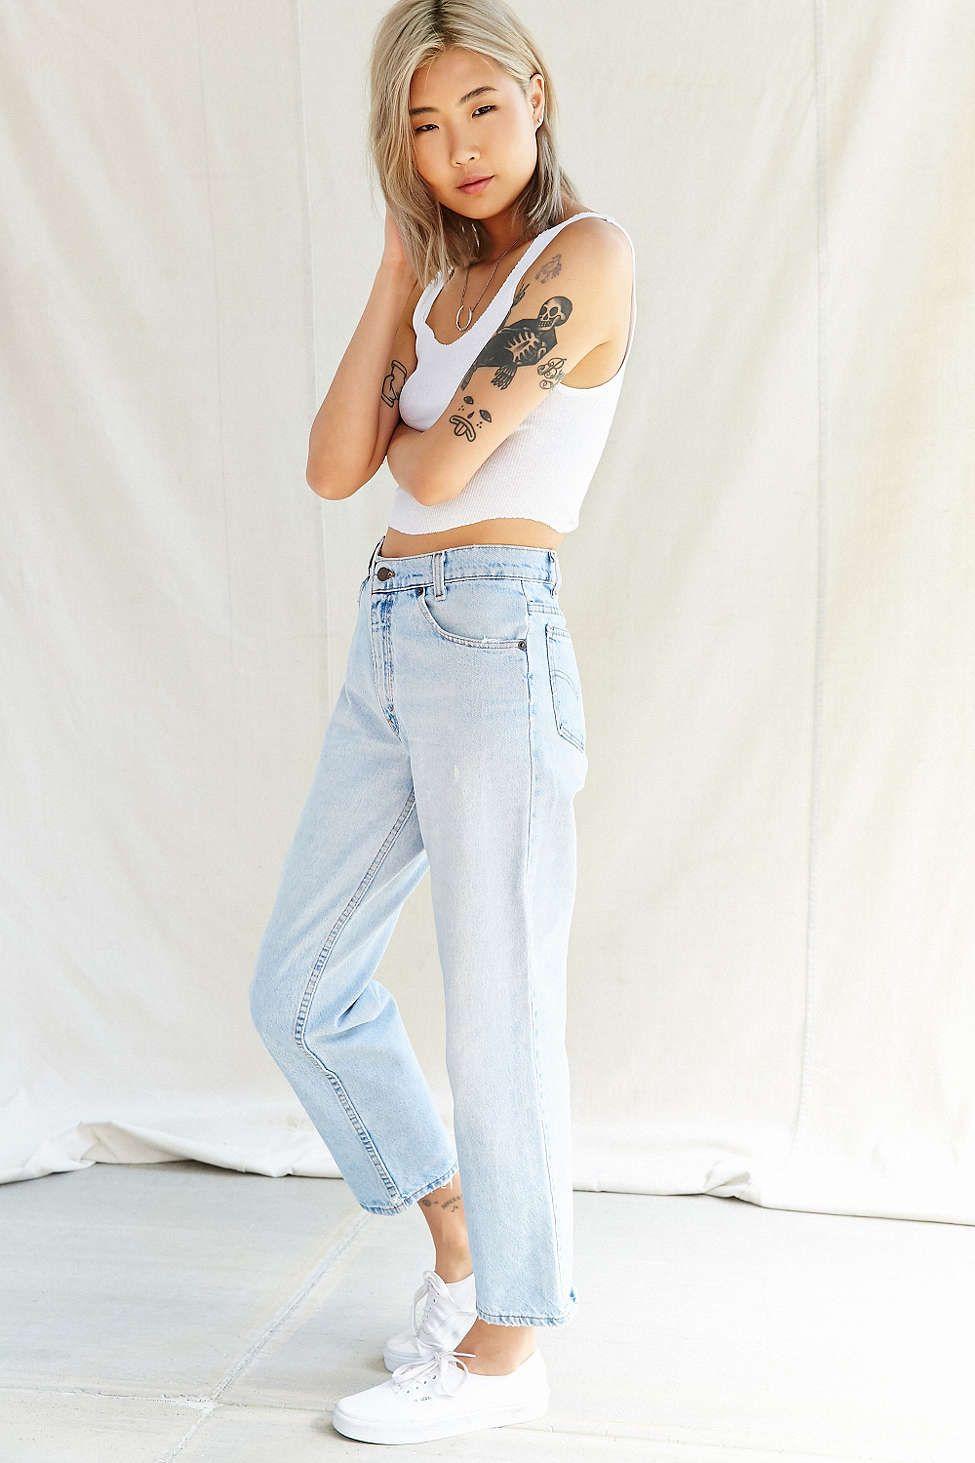 290b9703 Urban Renewal Vintage Levi's 550 Jean | Vintage | Levis 550 jeans ...